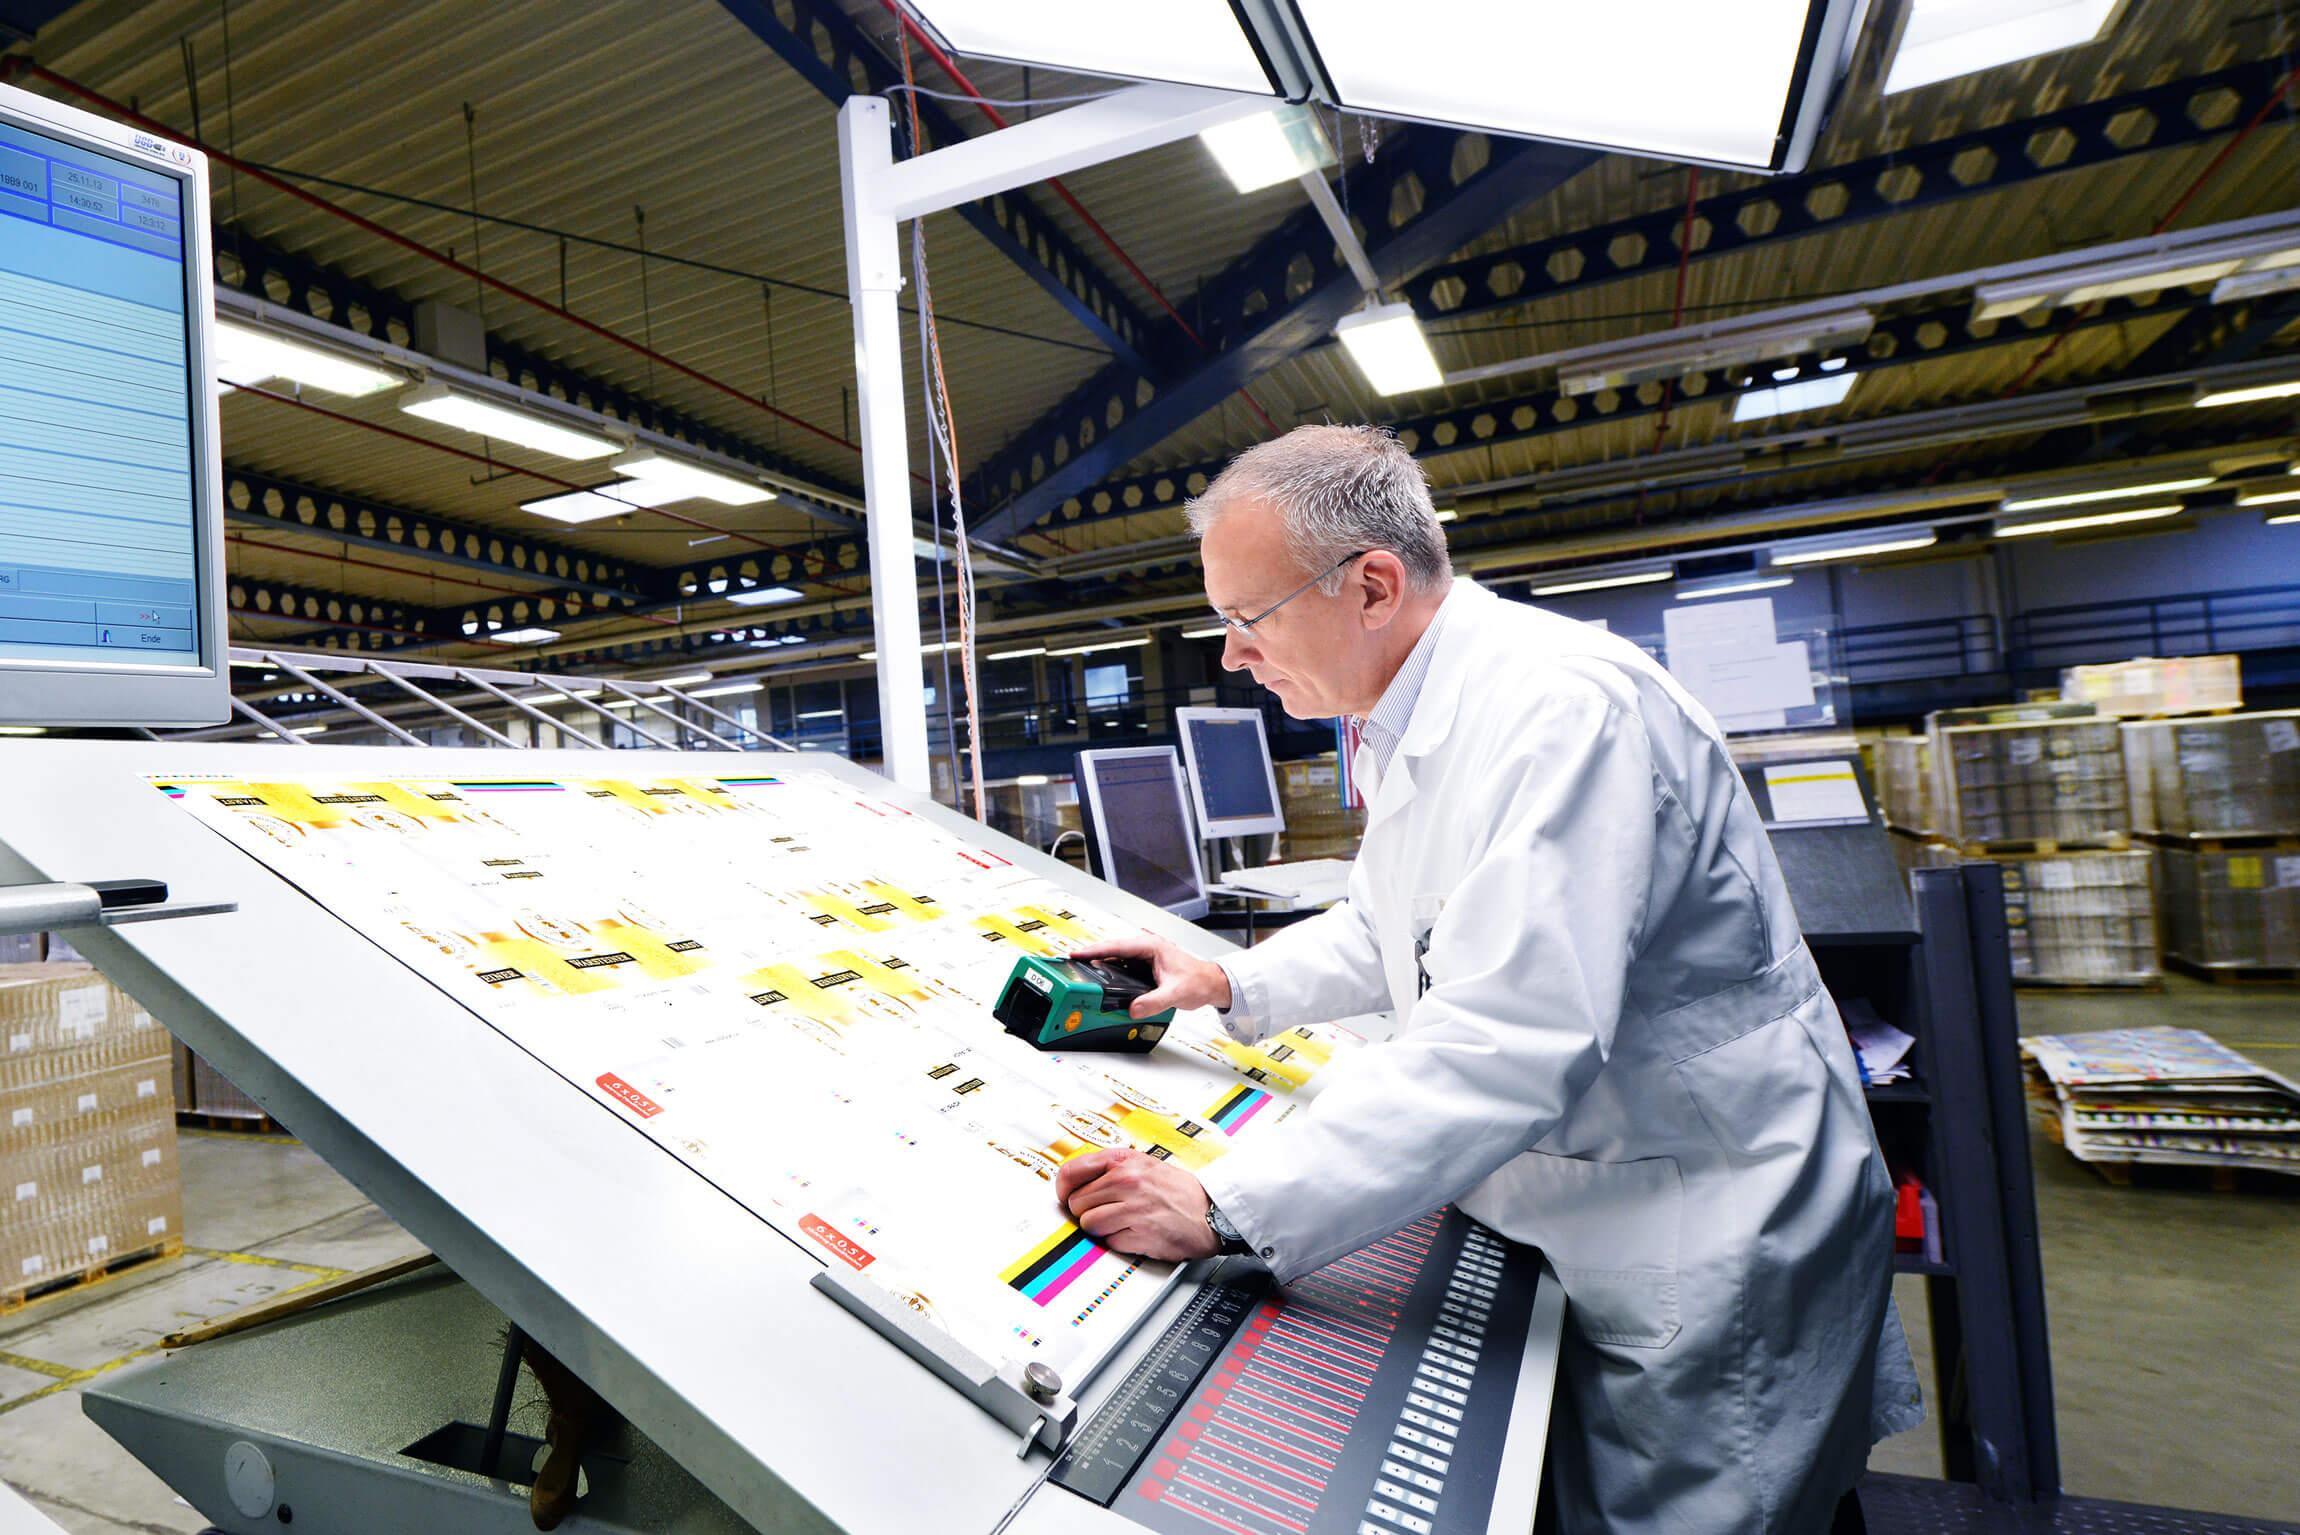 Kolorit Bremen Drucküberwachung Qualitätskontrolle